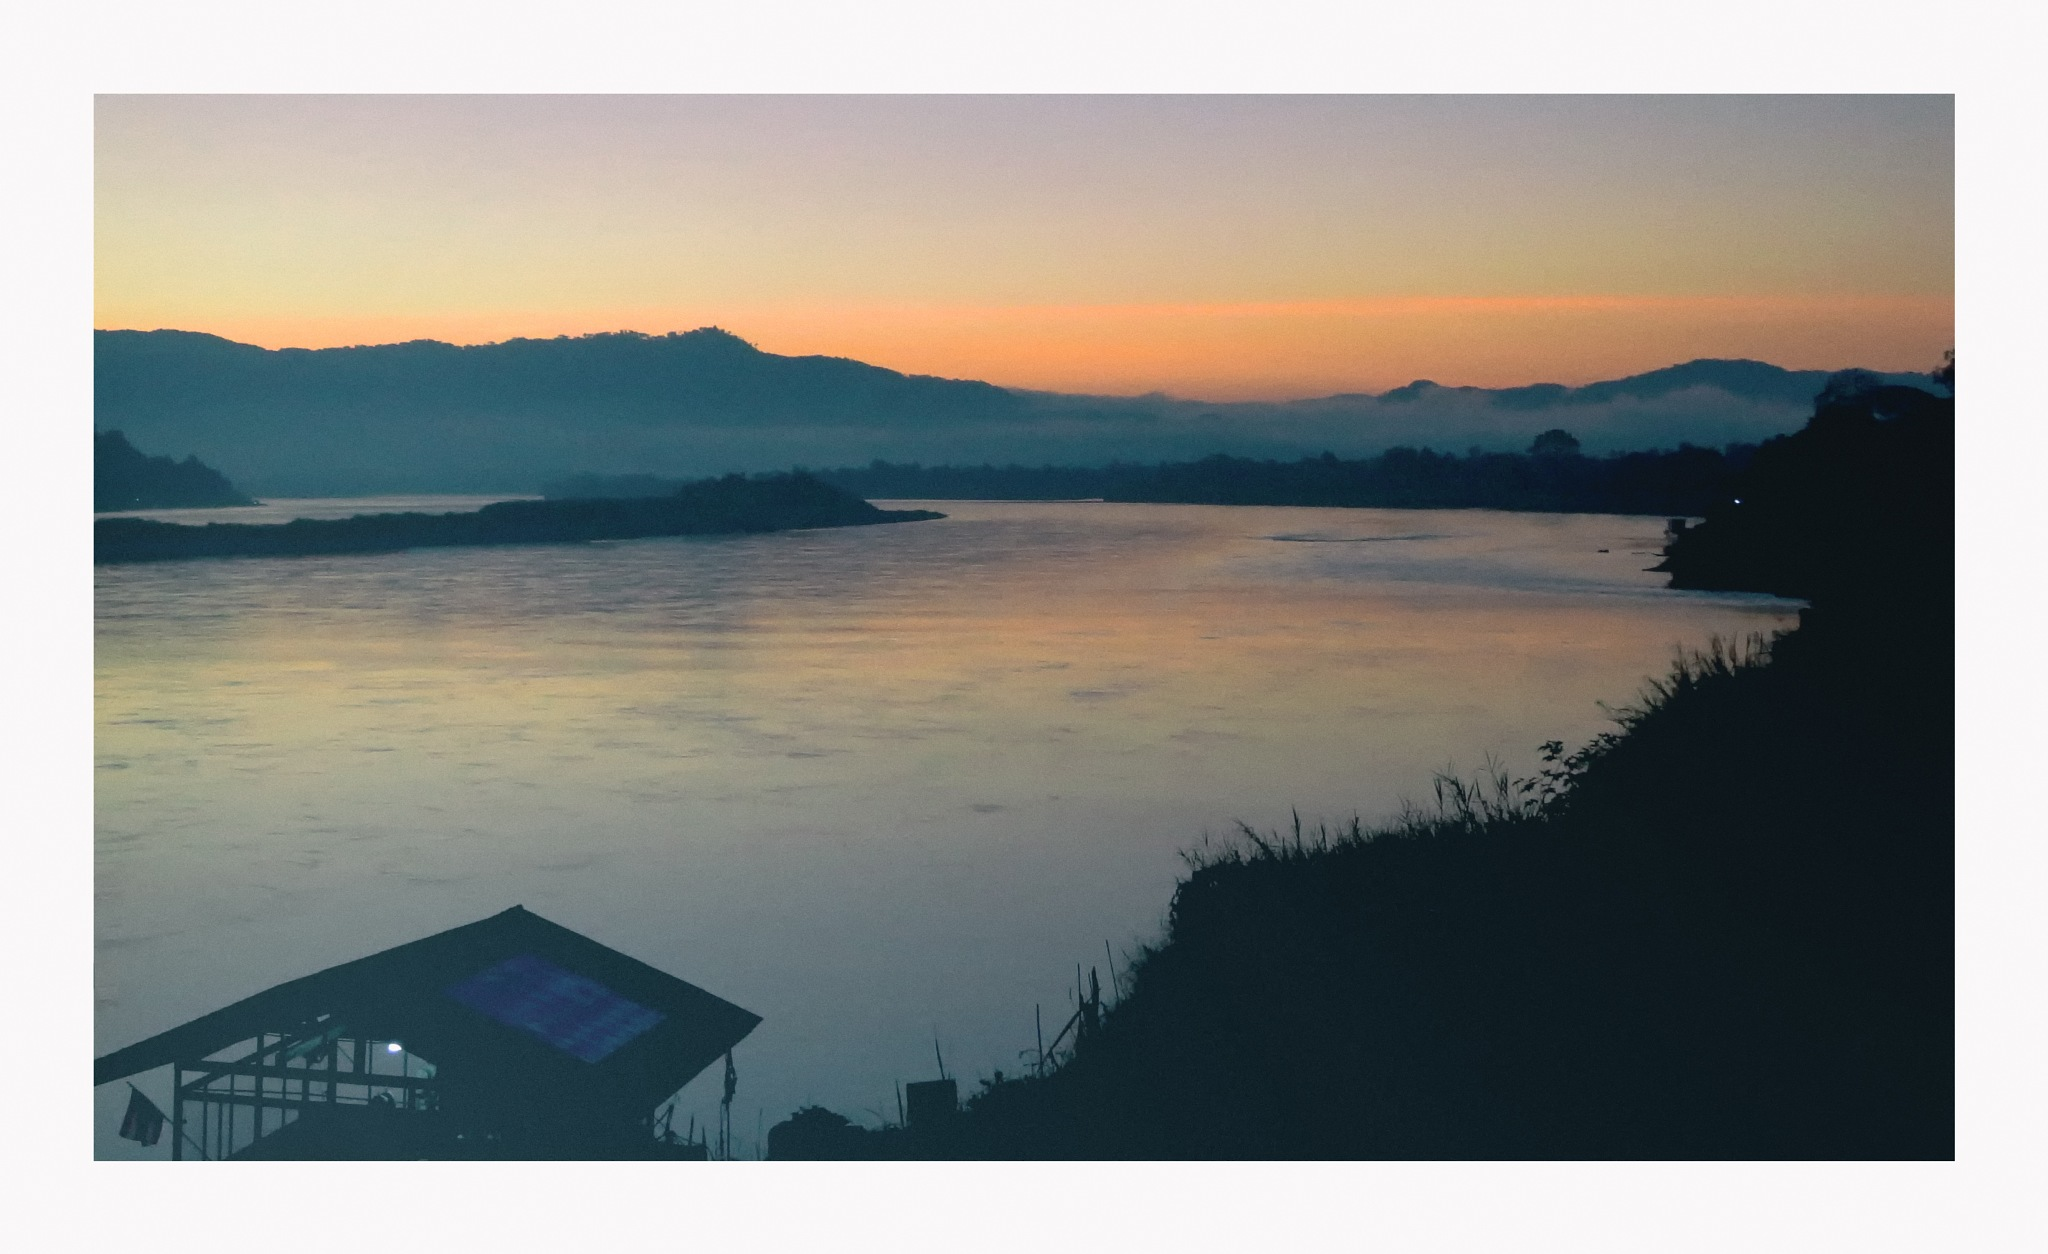 Chiang Khong by b17